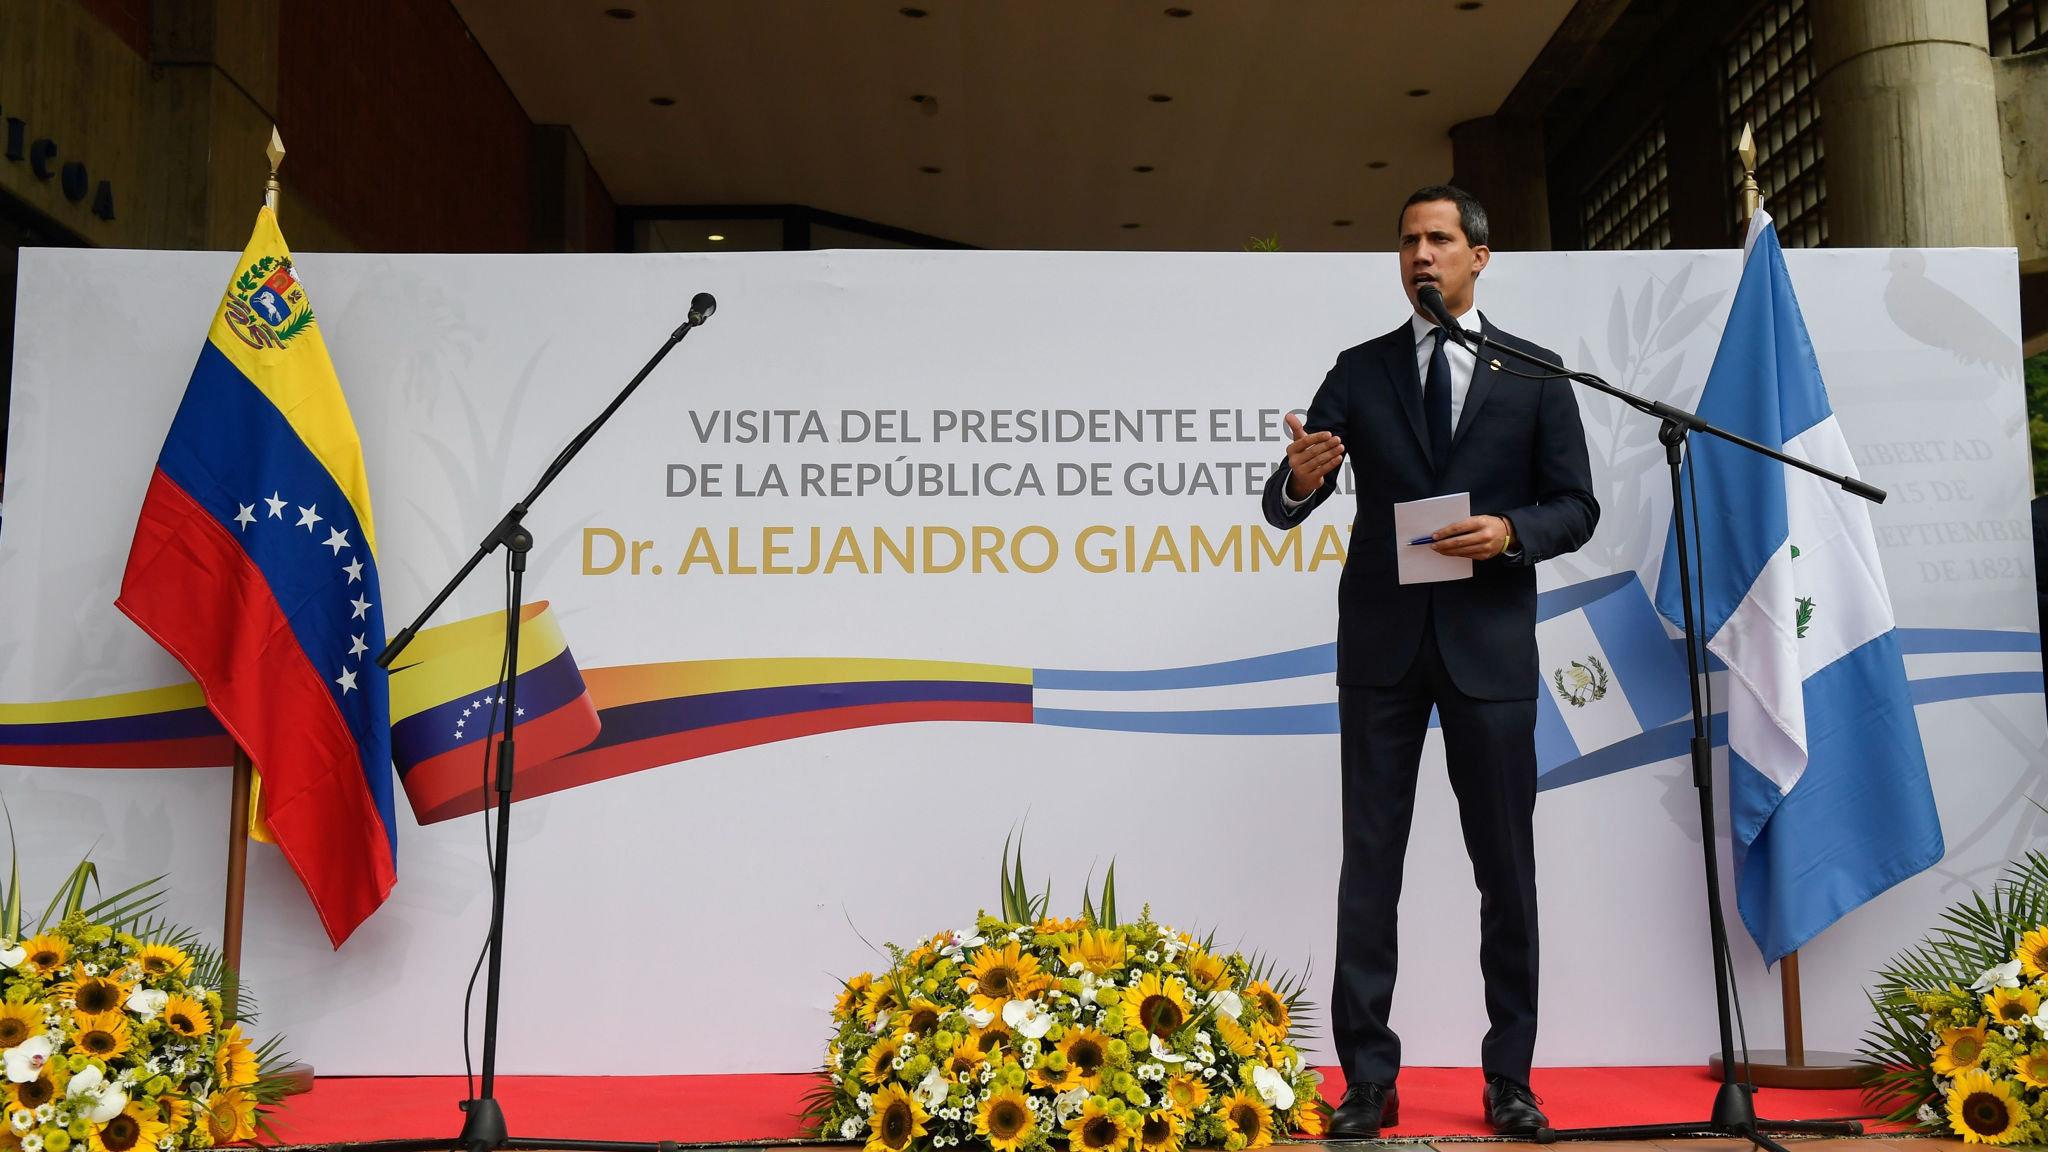 Venezuela turns away Guatemala's new president